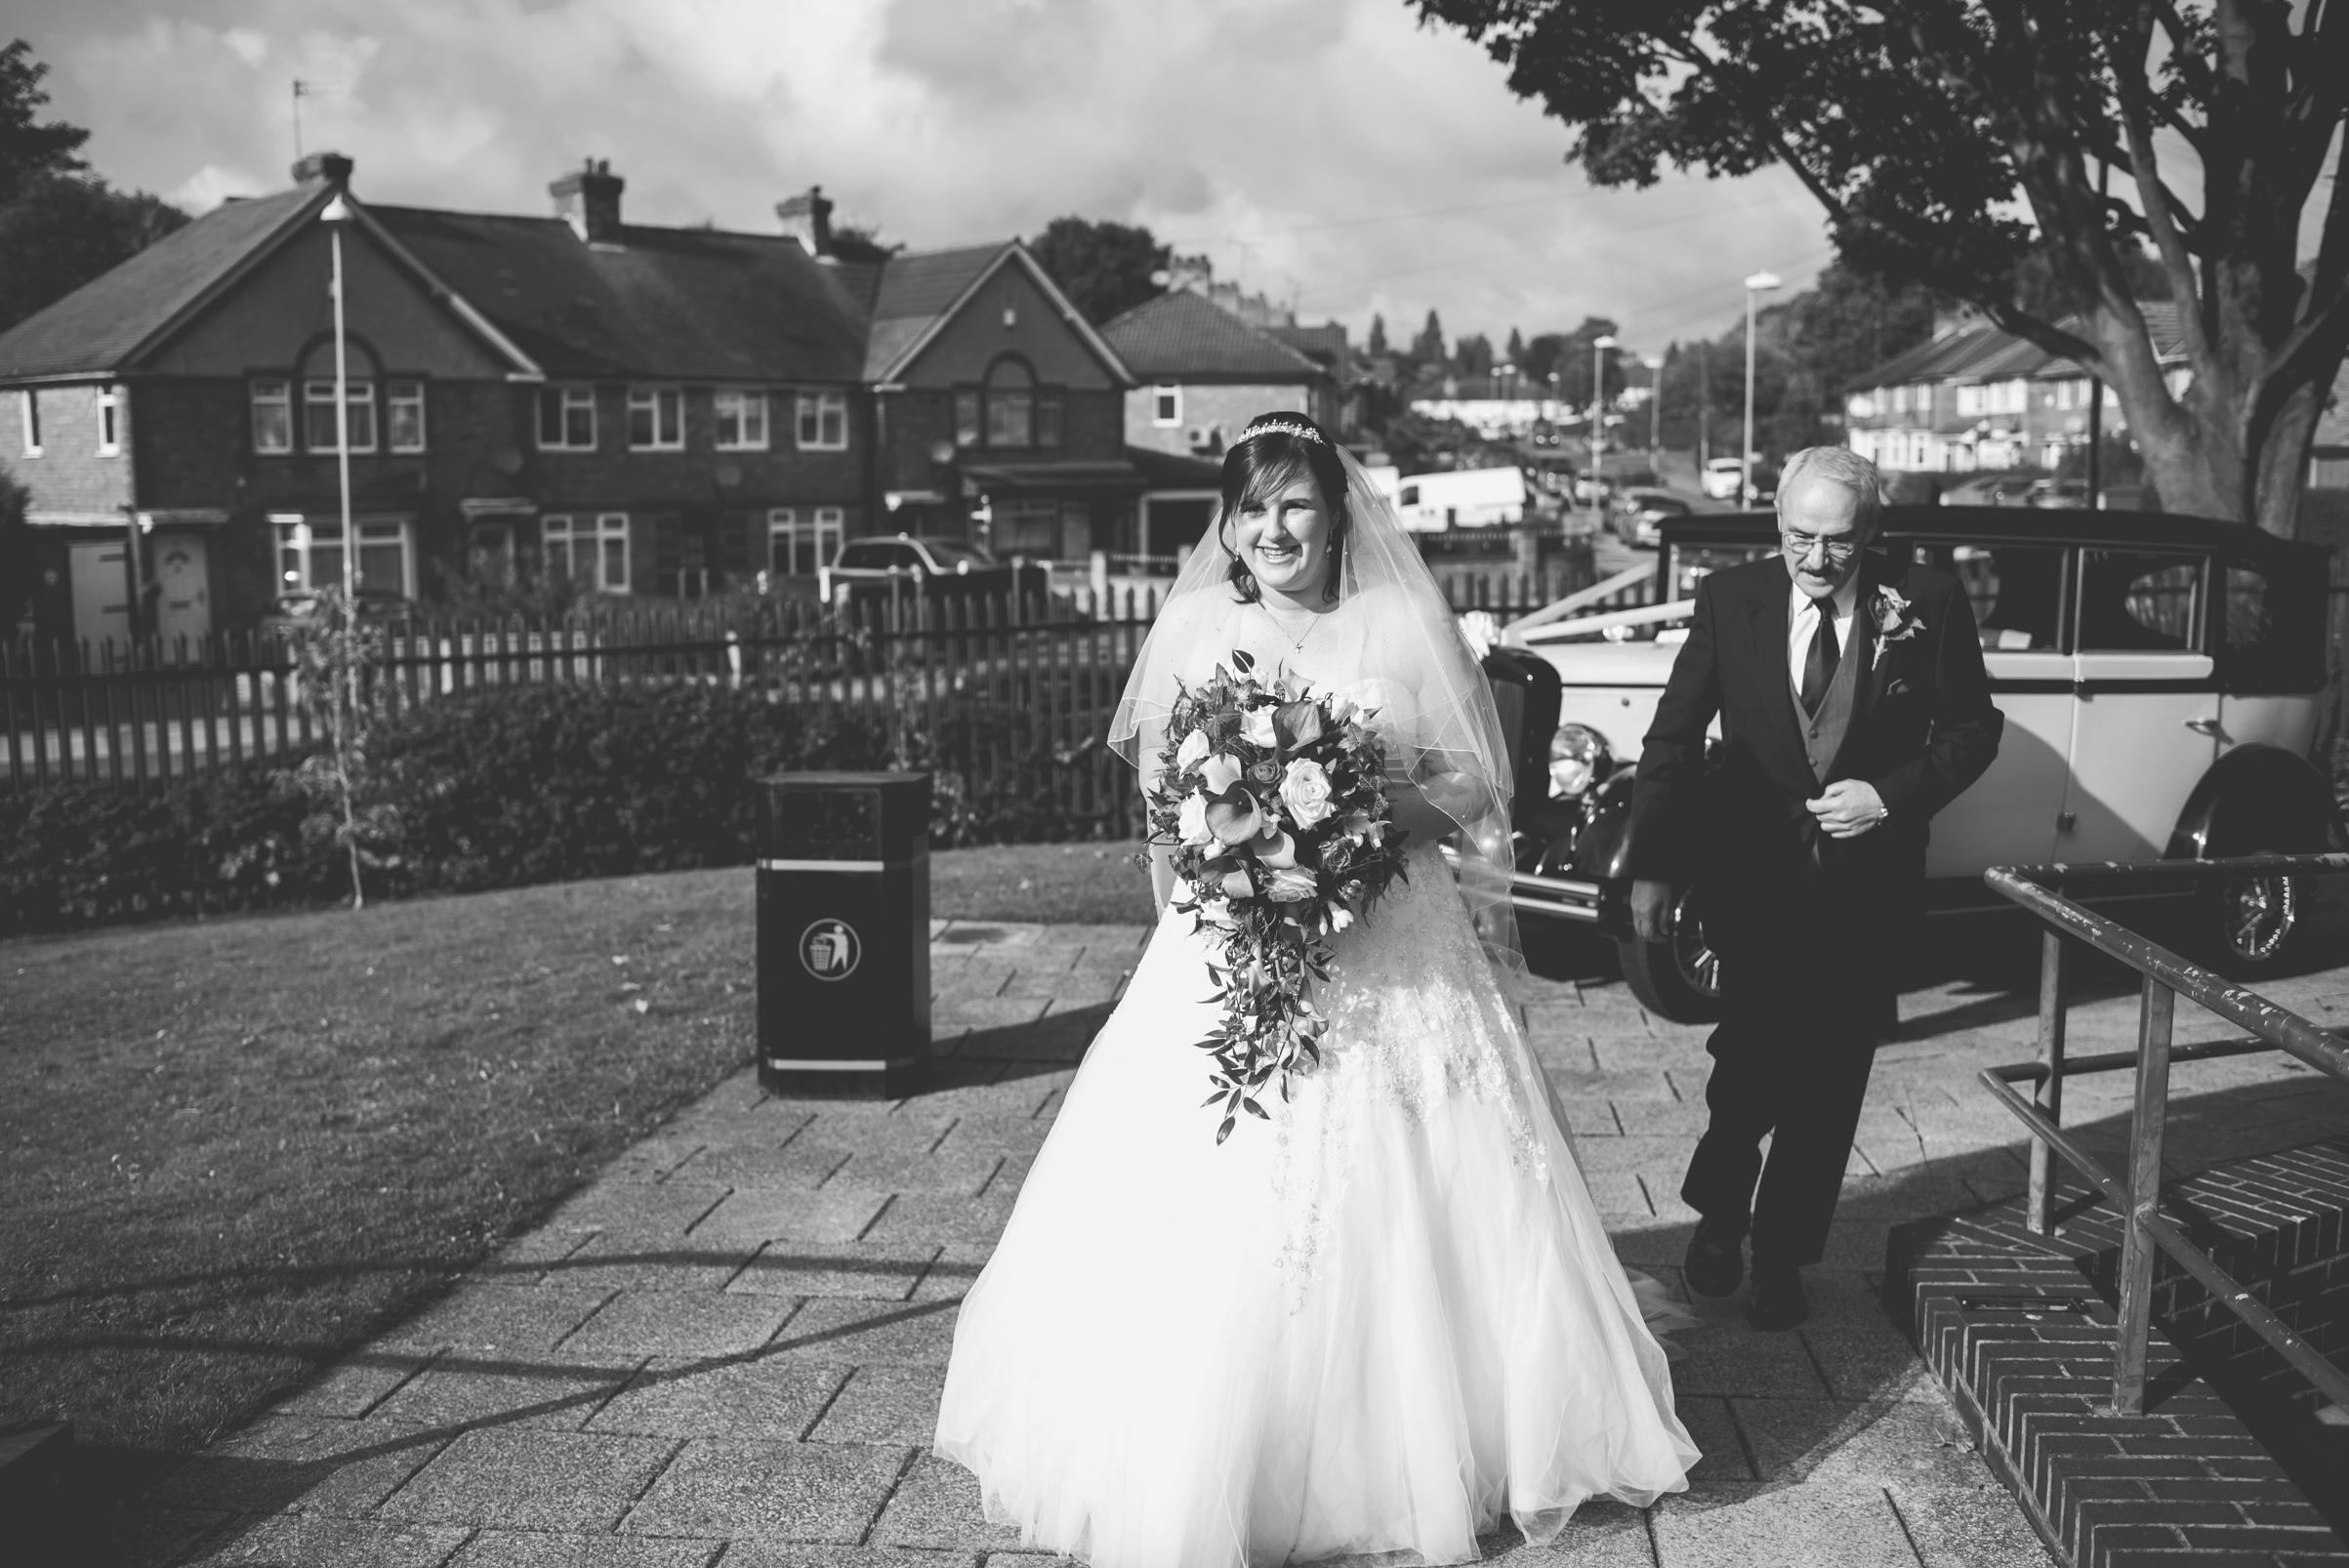 The+Fairlawns+wedding+Aldridge+StLukes+Church-77.jpg